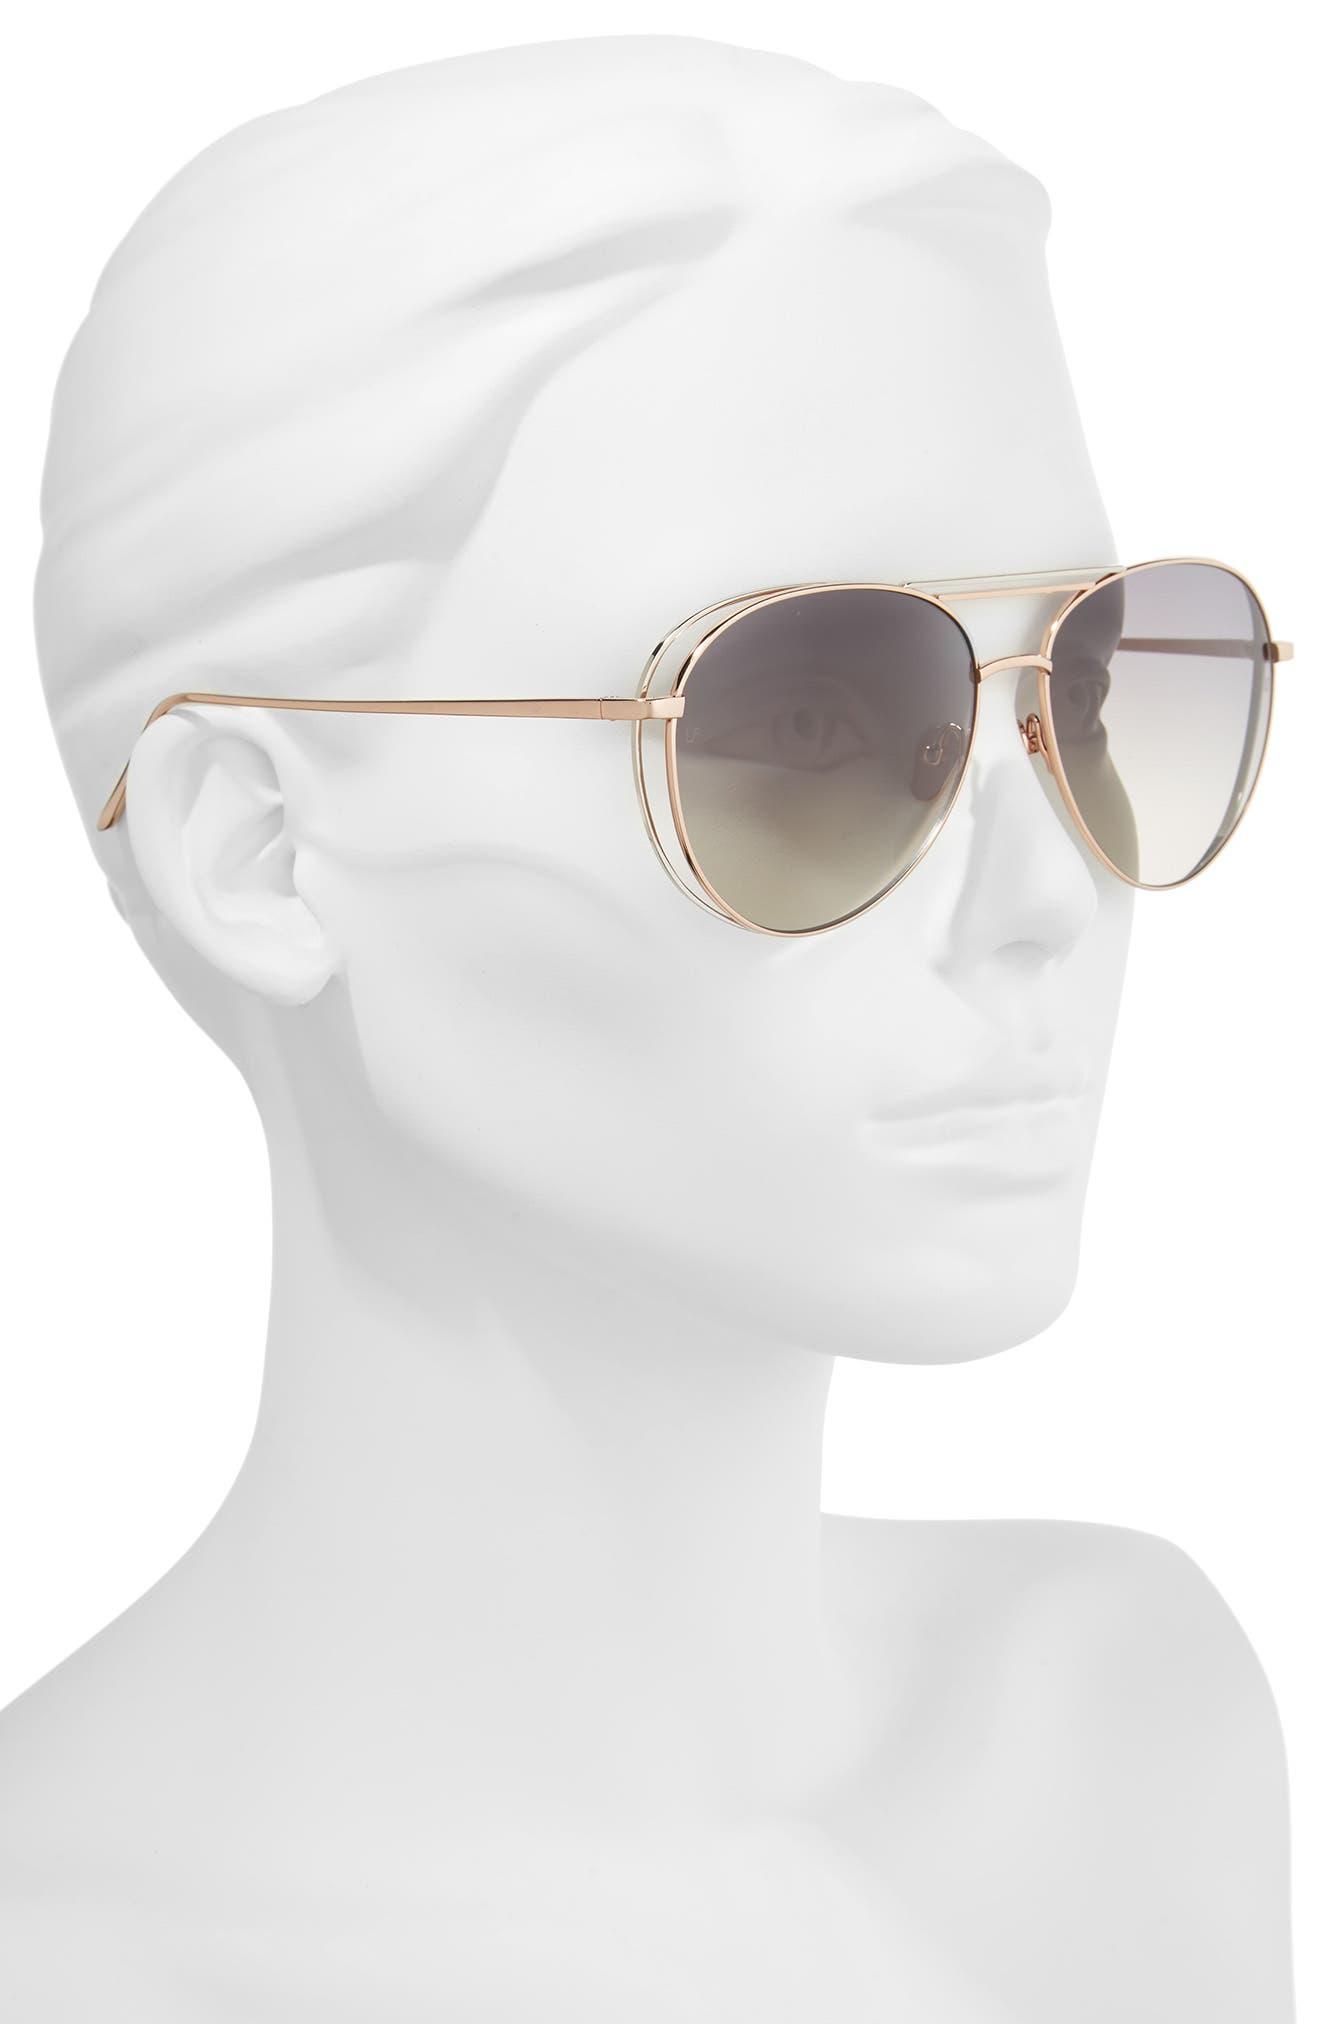 61mm 18 Karat Gold Aviator Sunglasses,                             Alternate thumbnail 2, color,                             Rose Gold White Gold/ Grey